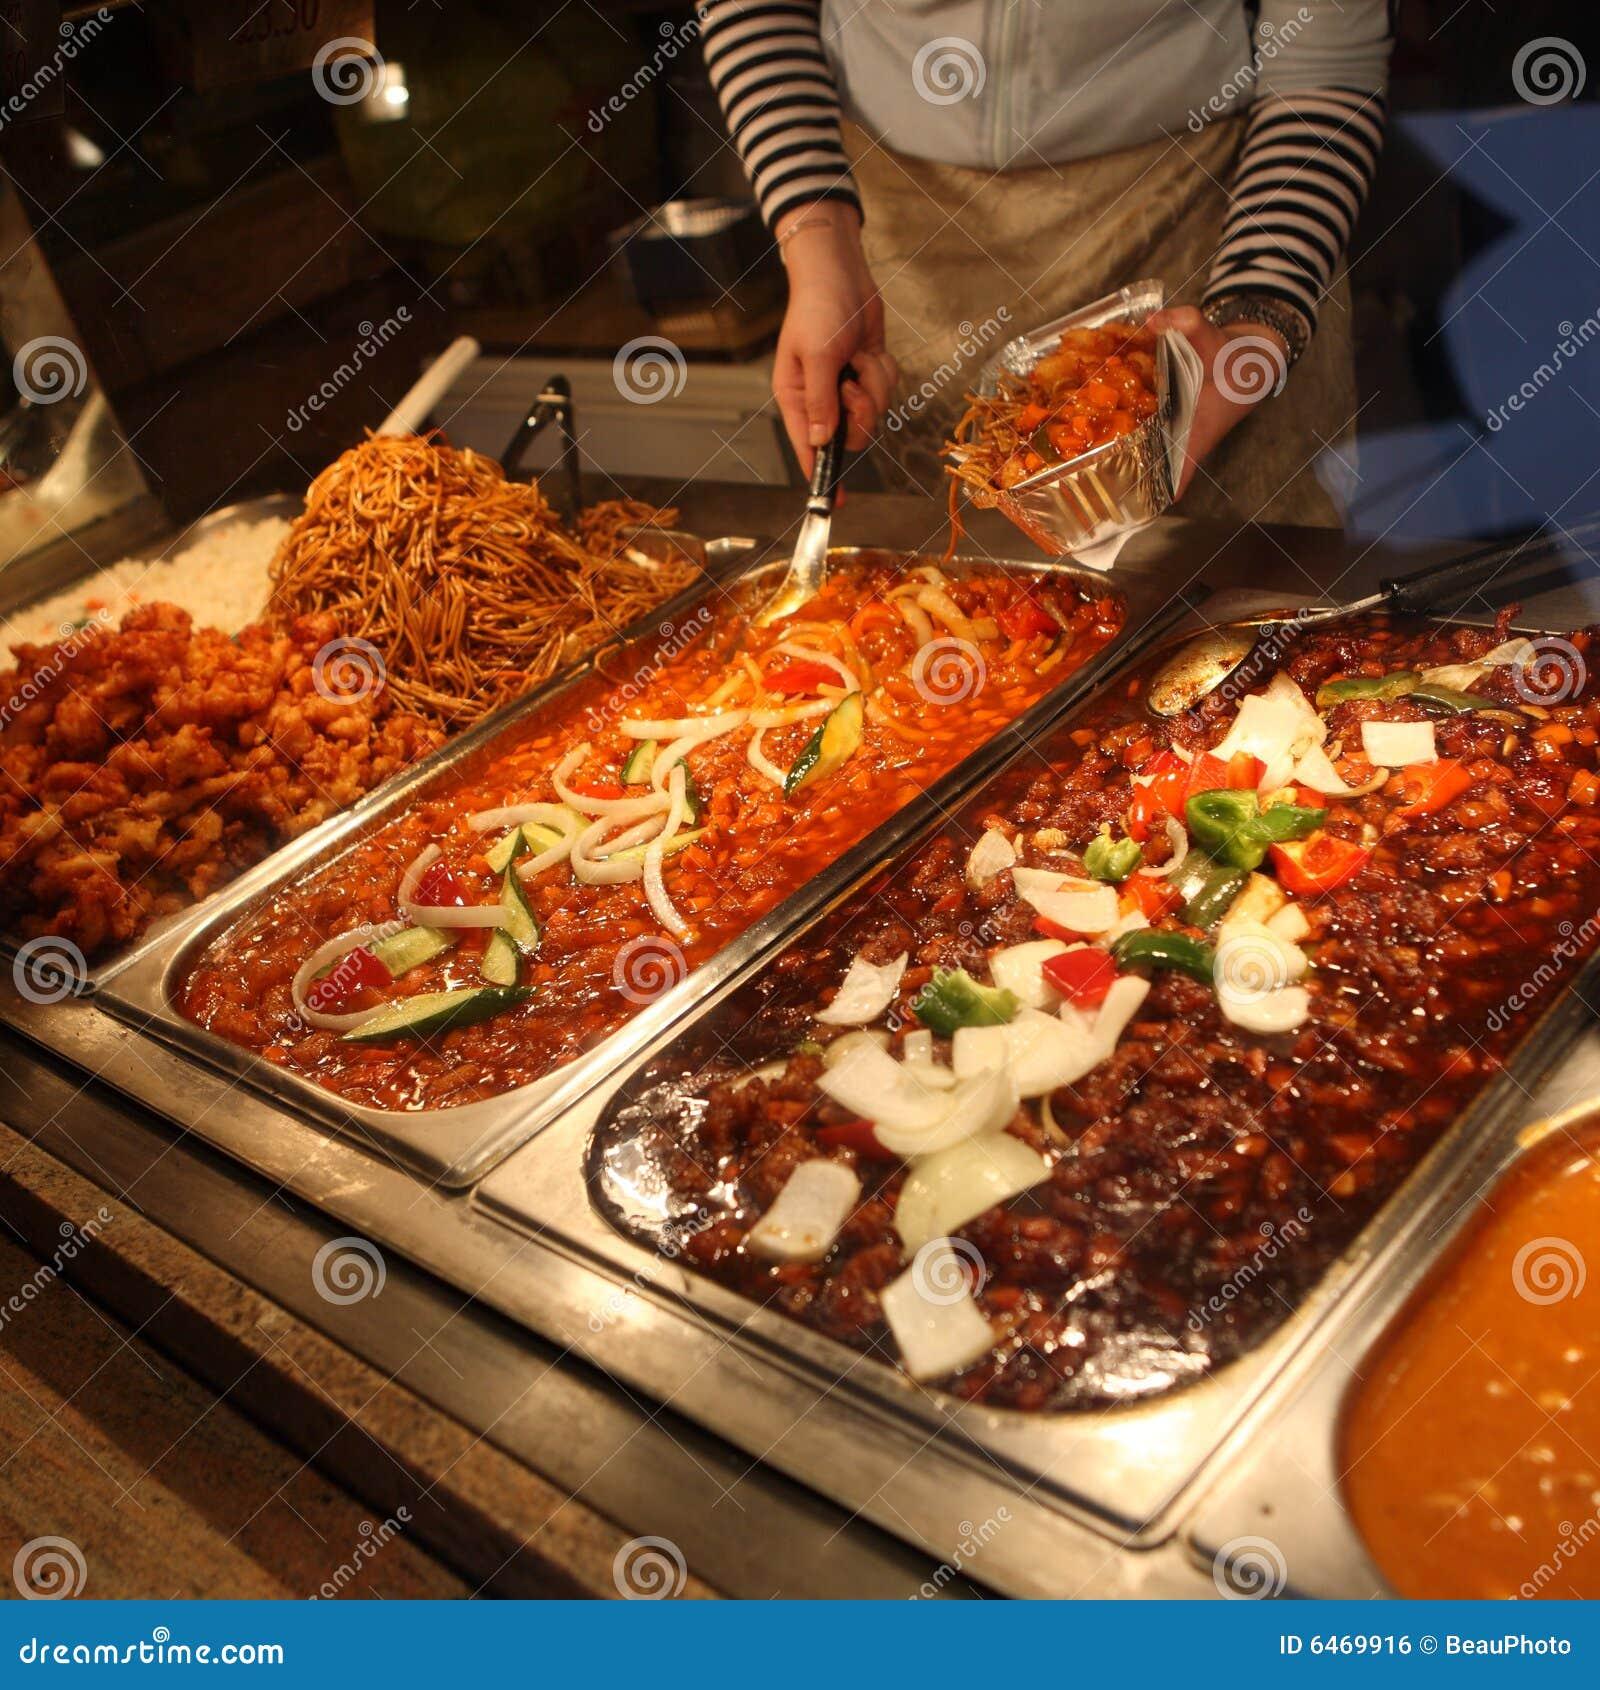 Japanese festival food - alyssa and carla